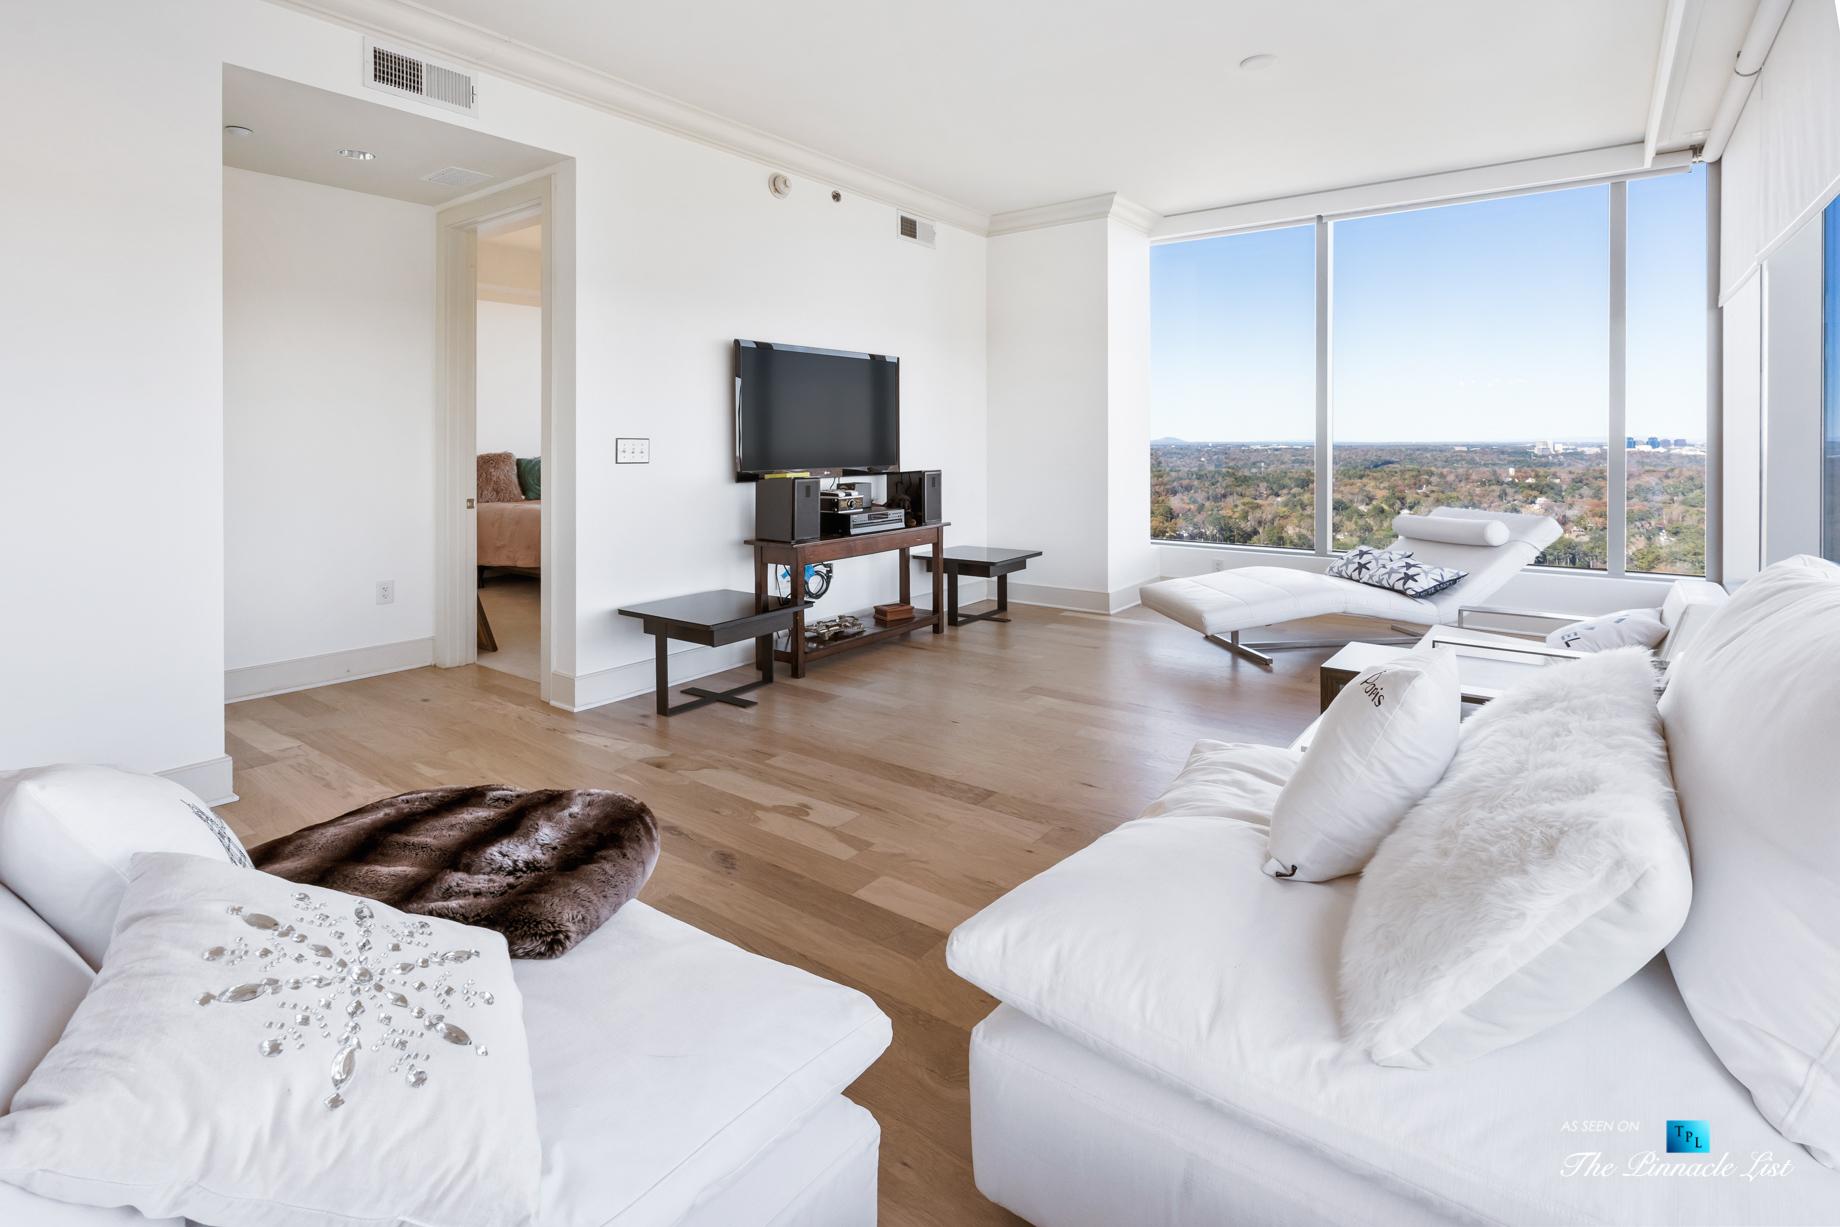 3630 Peachtree Rd NE, Unit 2808, Atlanta, GA, USA – Condo Living Room – Luxury Real Estate – The Ritz-Carlton Residences Buckhead